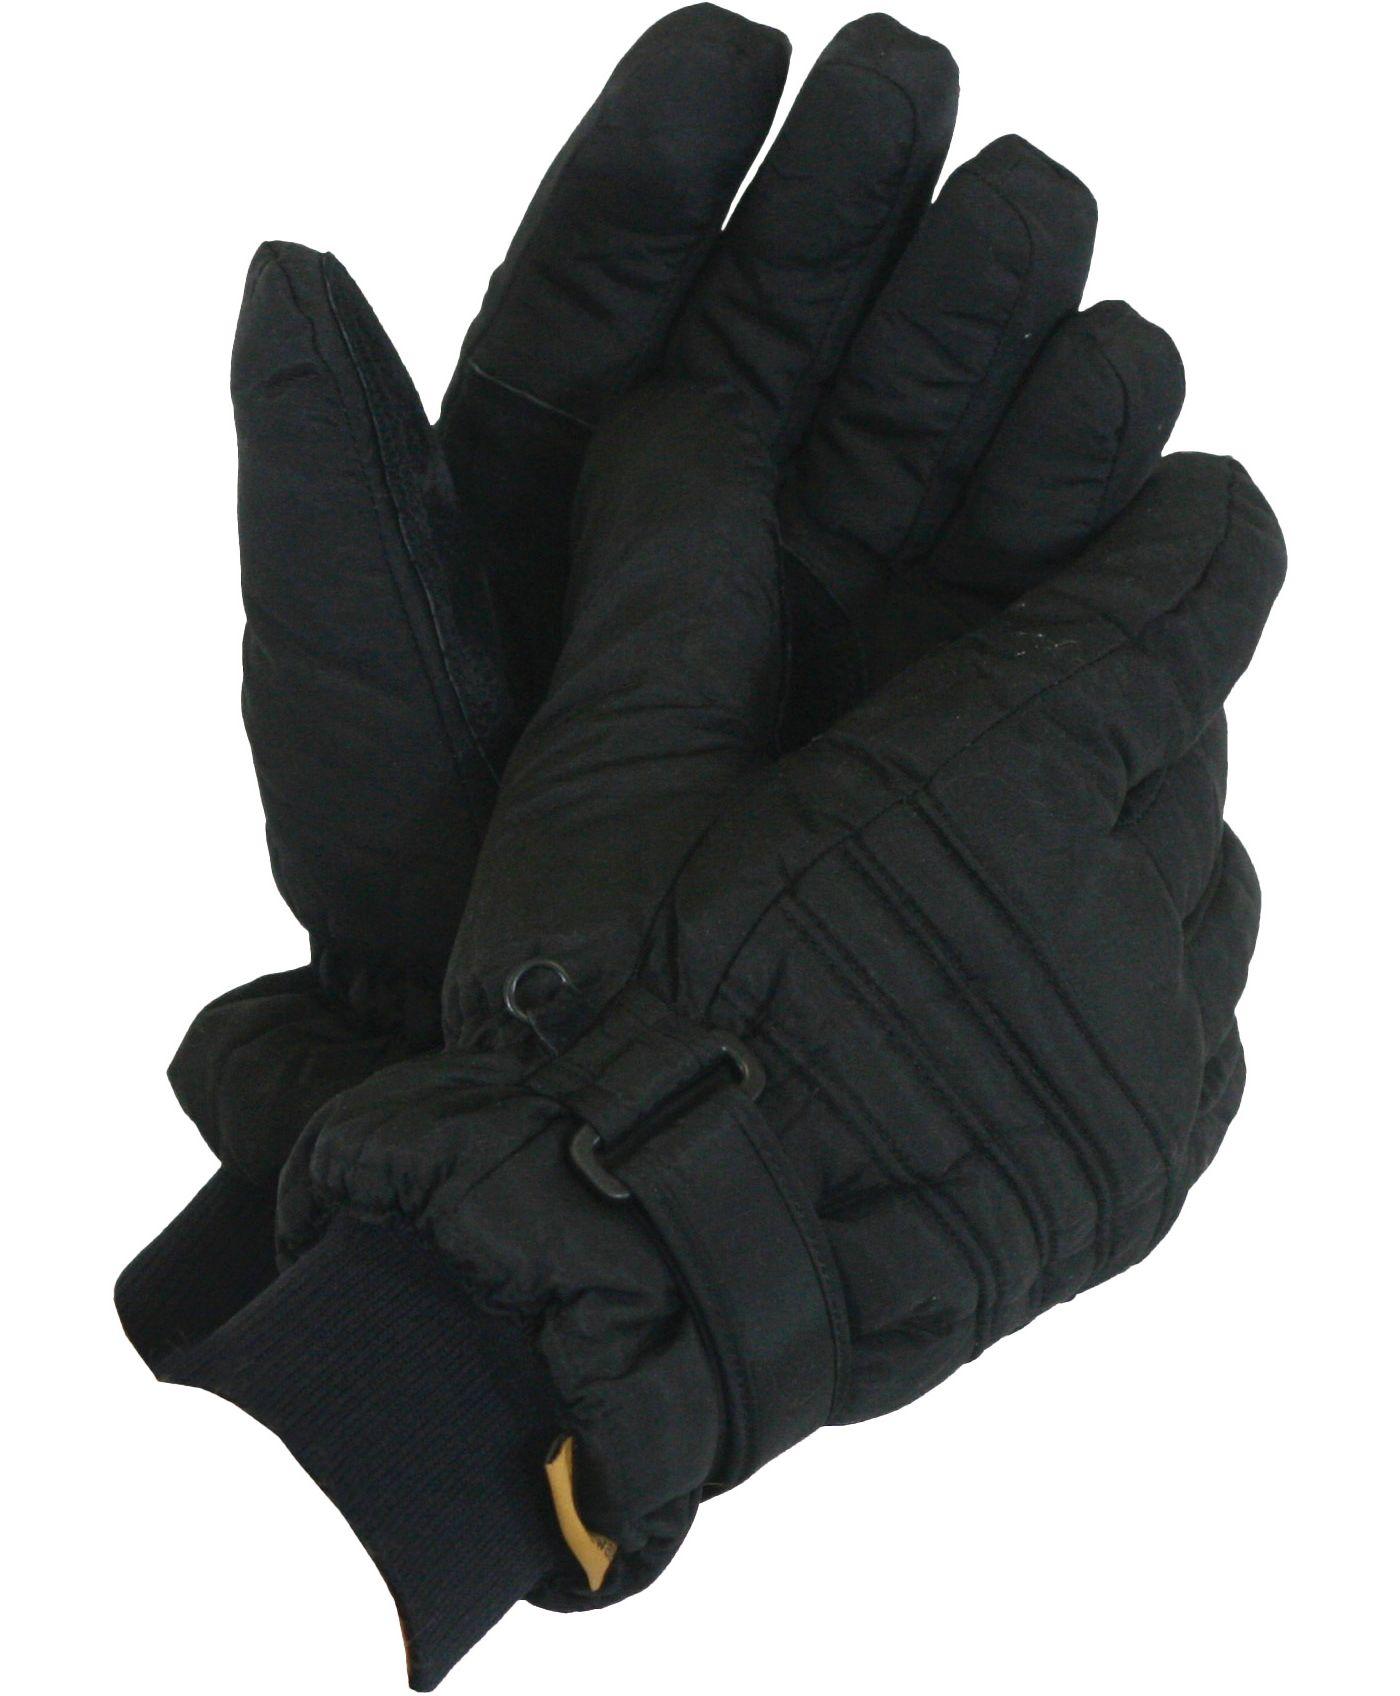 Blocker Outdoors RainBlocker Thinsulate Slip-On Gloves